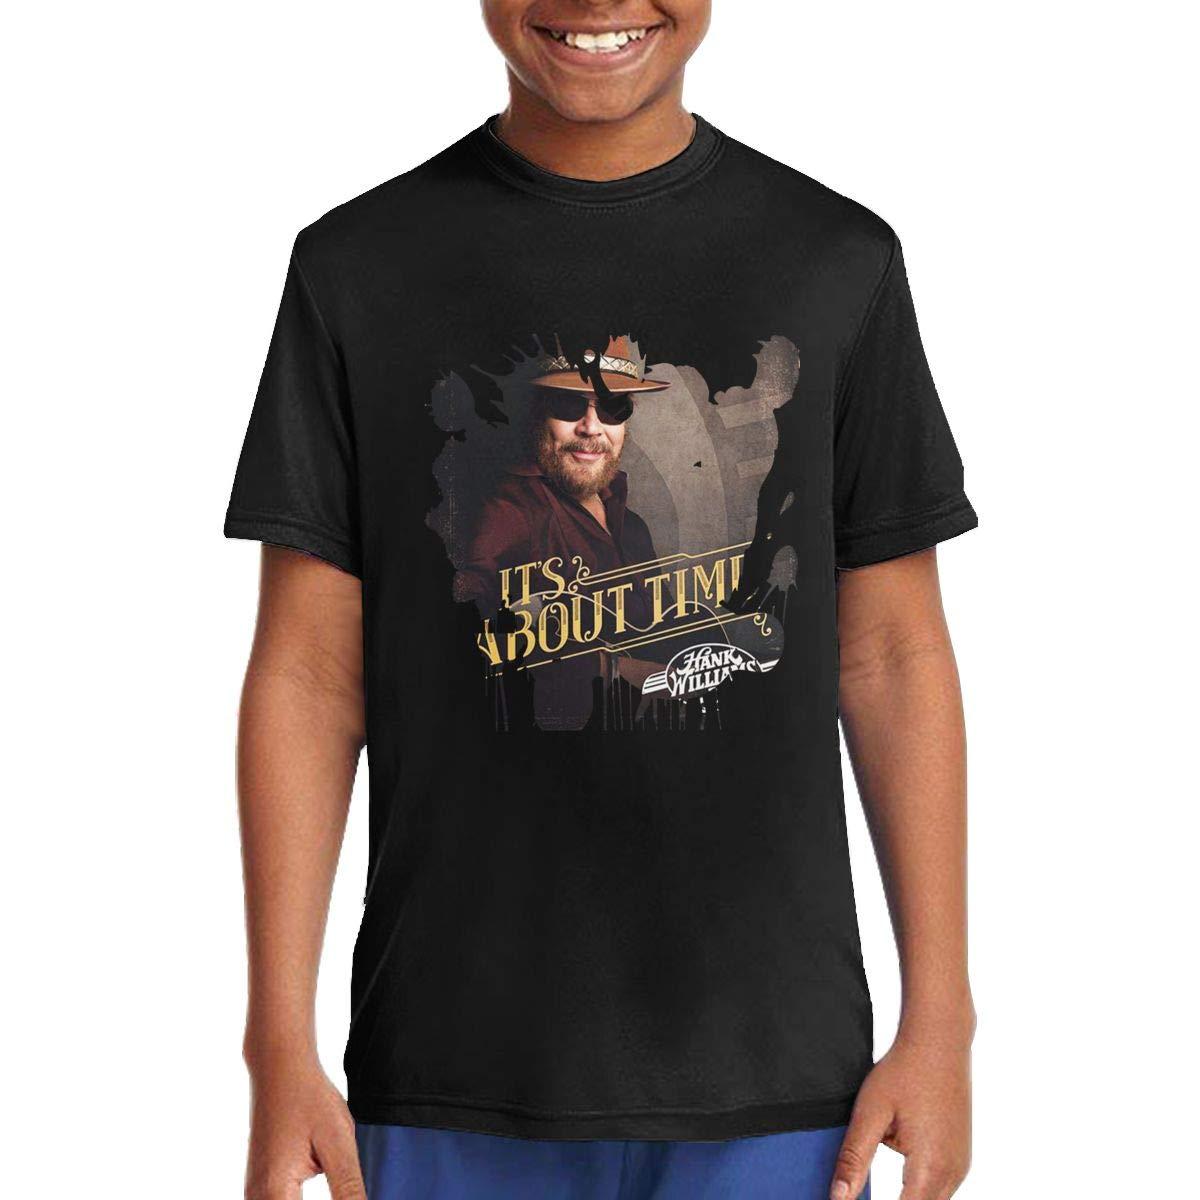 Kids Soft Hank Williams Jr Its About Tim Cotton Music Anime Cartoon Cool Short Sleeves Summer T-Shirt Gift